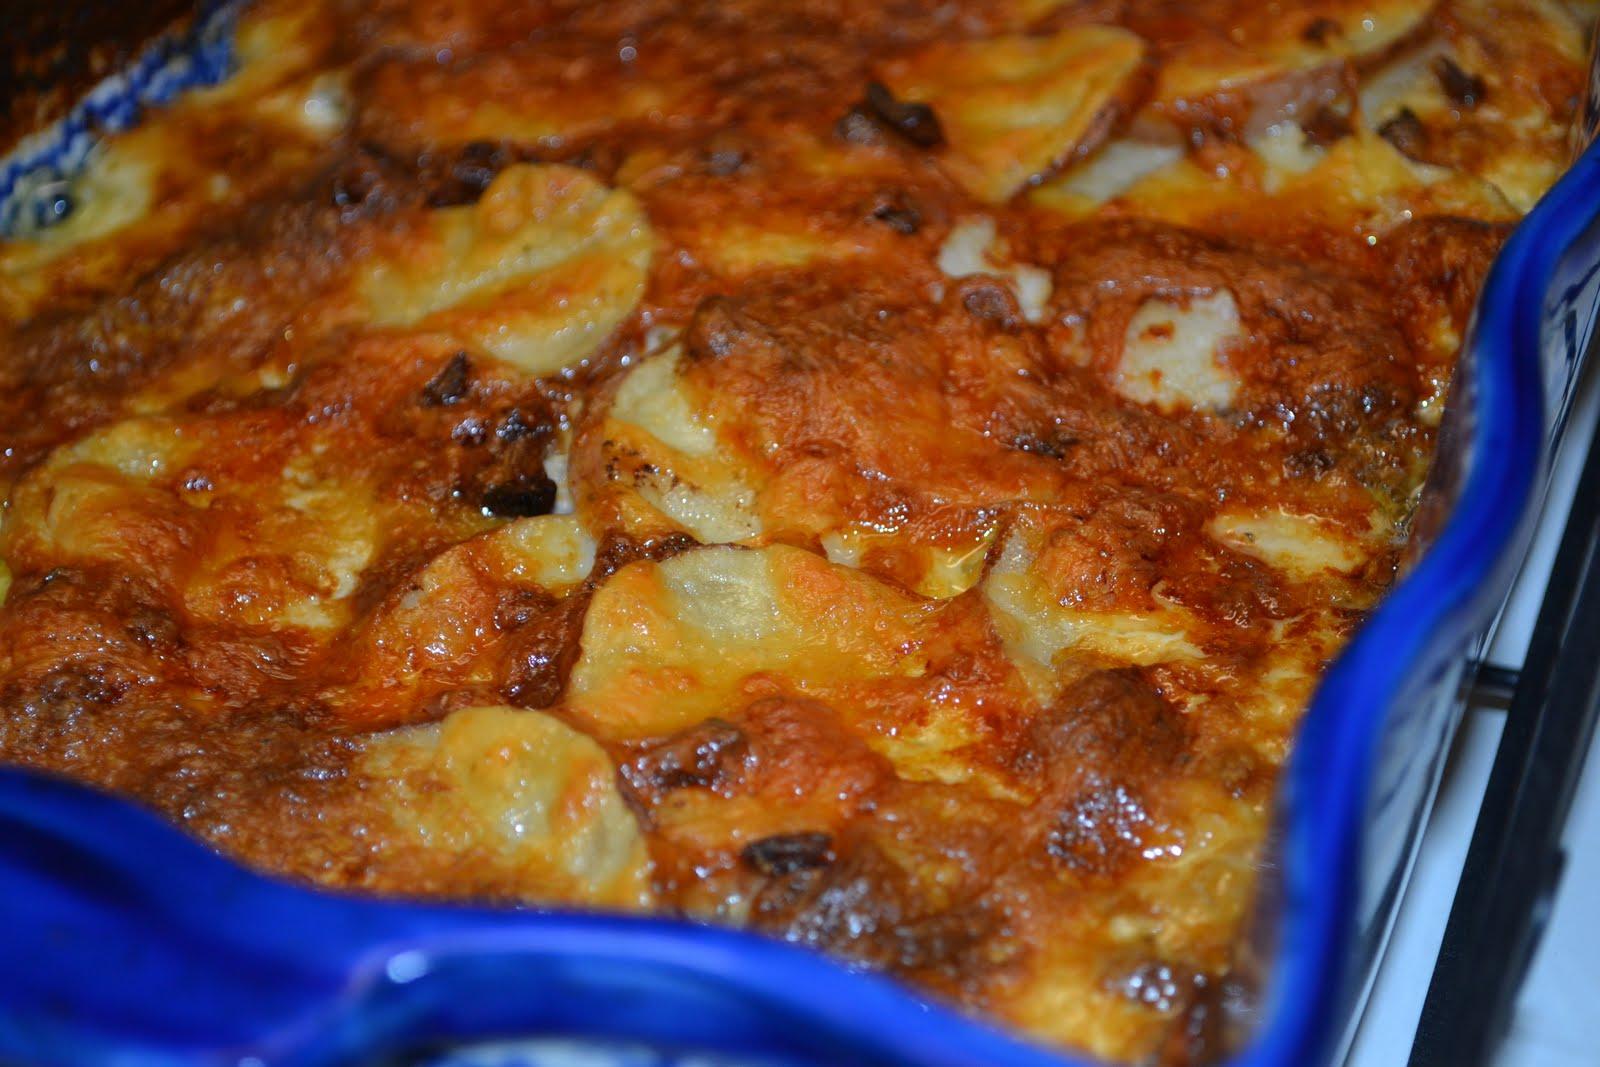 Creamy Gouda & Garlic Potatoes Au Gratin